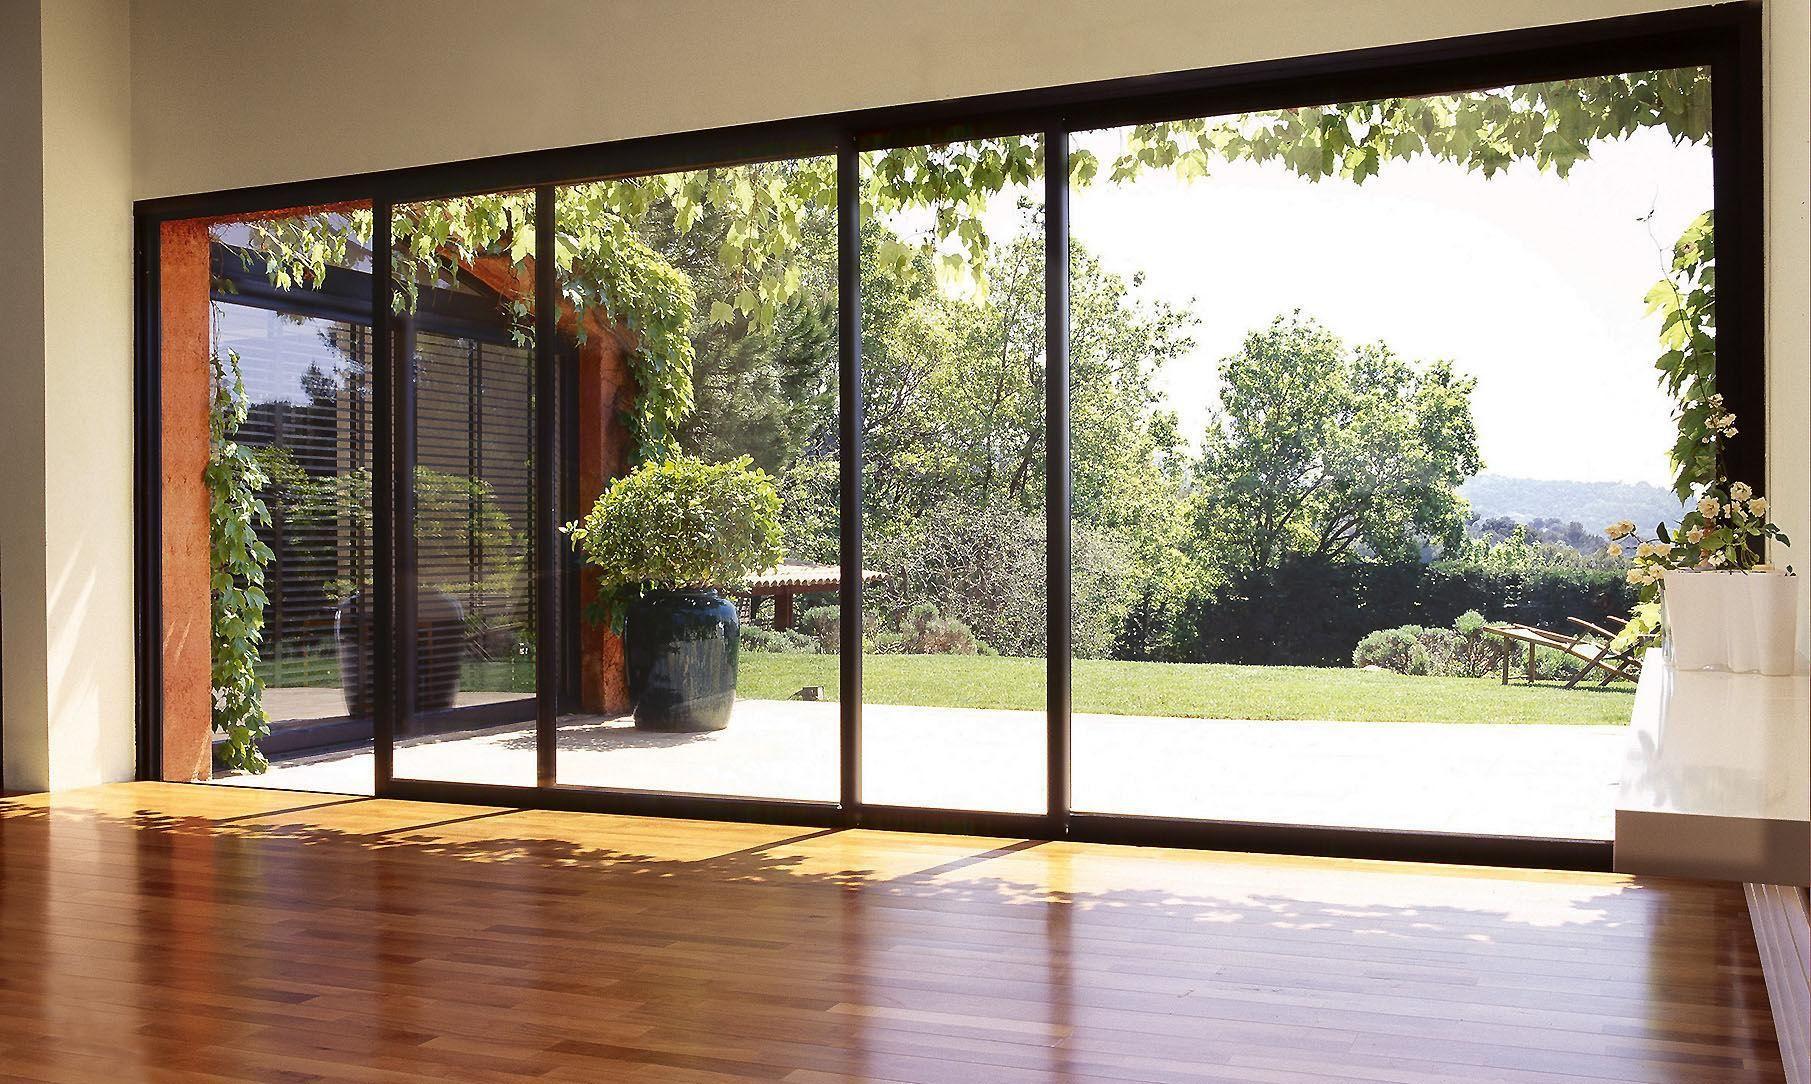 Window Coverings Doors Windows Sliding Glass Door Windows And Doors Aluminium Sliding Doors